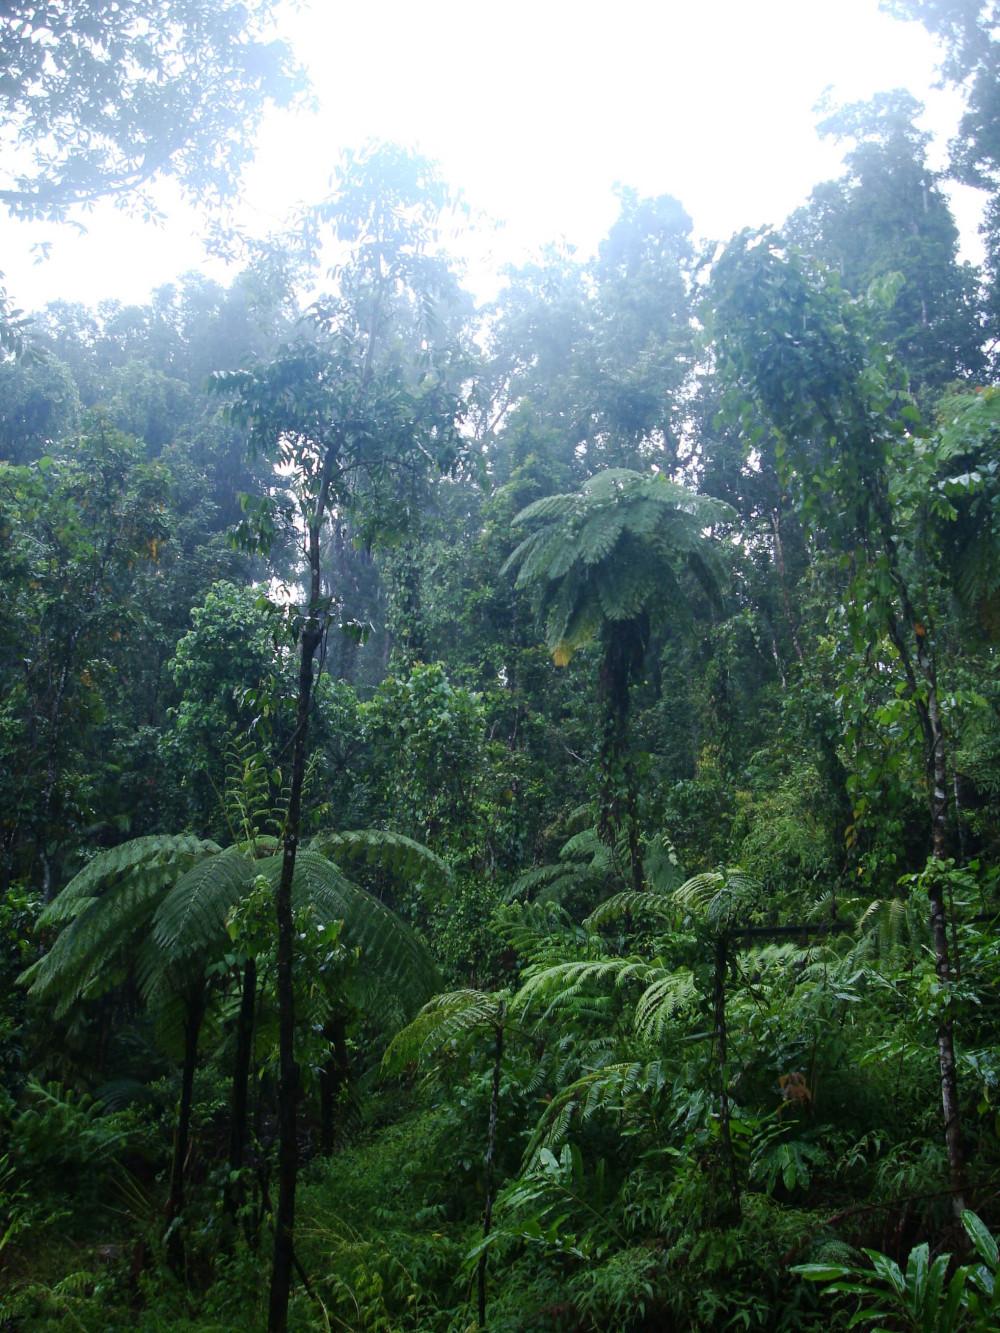 Rainforest at Atherton Tablelands